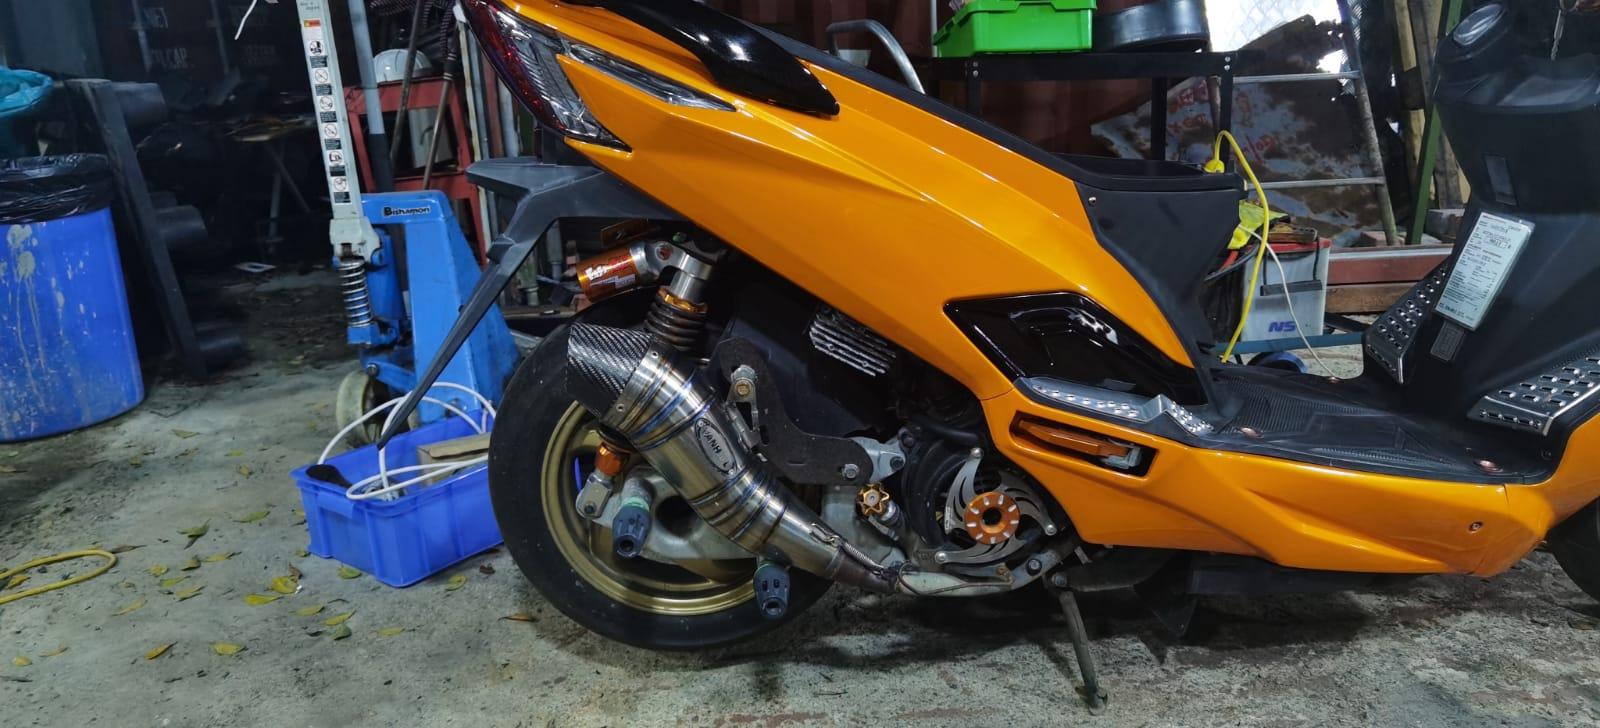 【個人自售】 SYM 三陽 Fighter 4V 150 二手車 2013年 - 「Webike摩托車市」